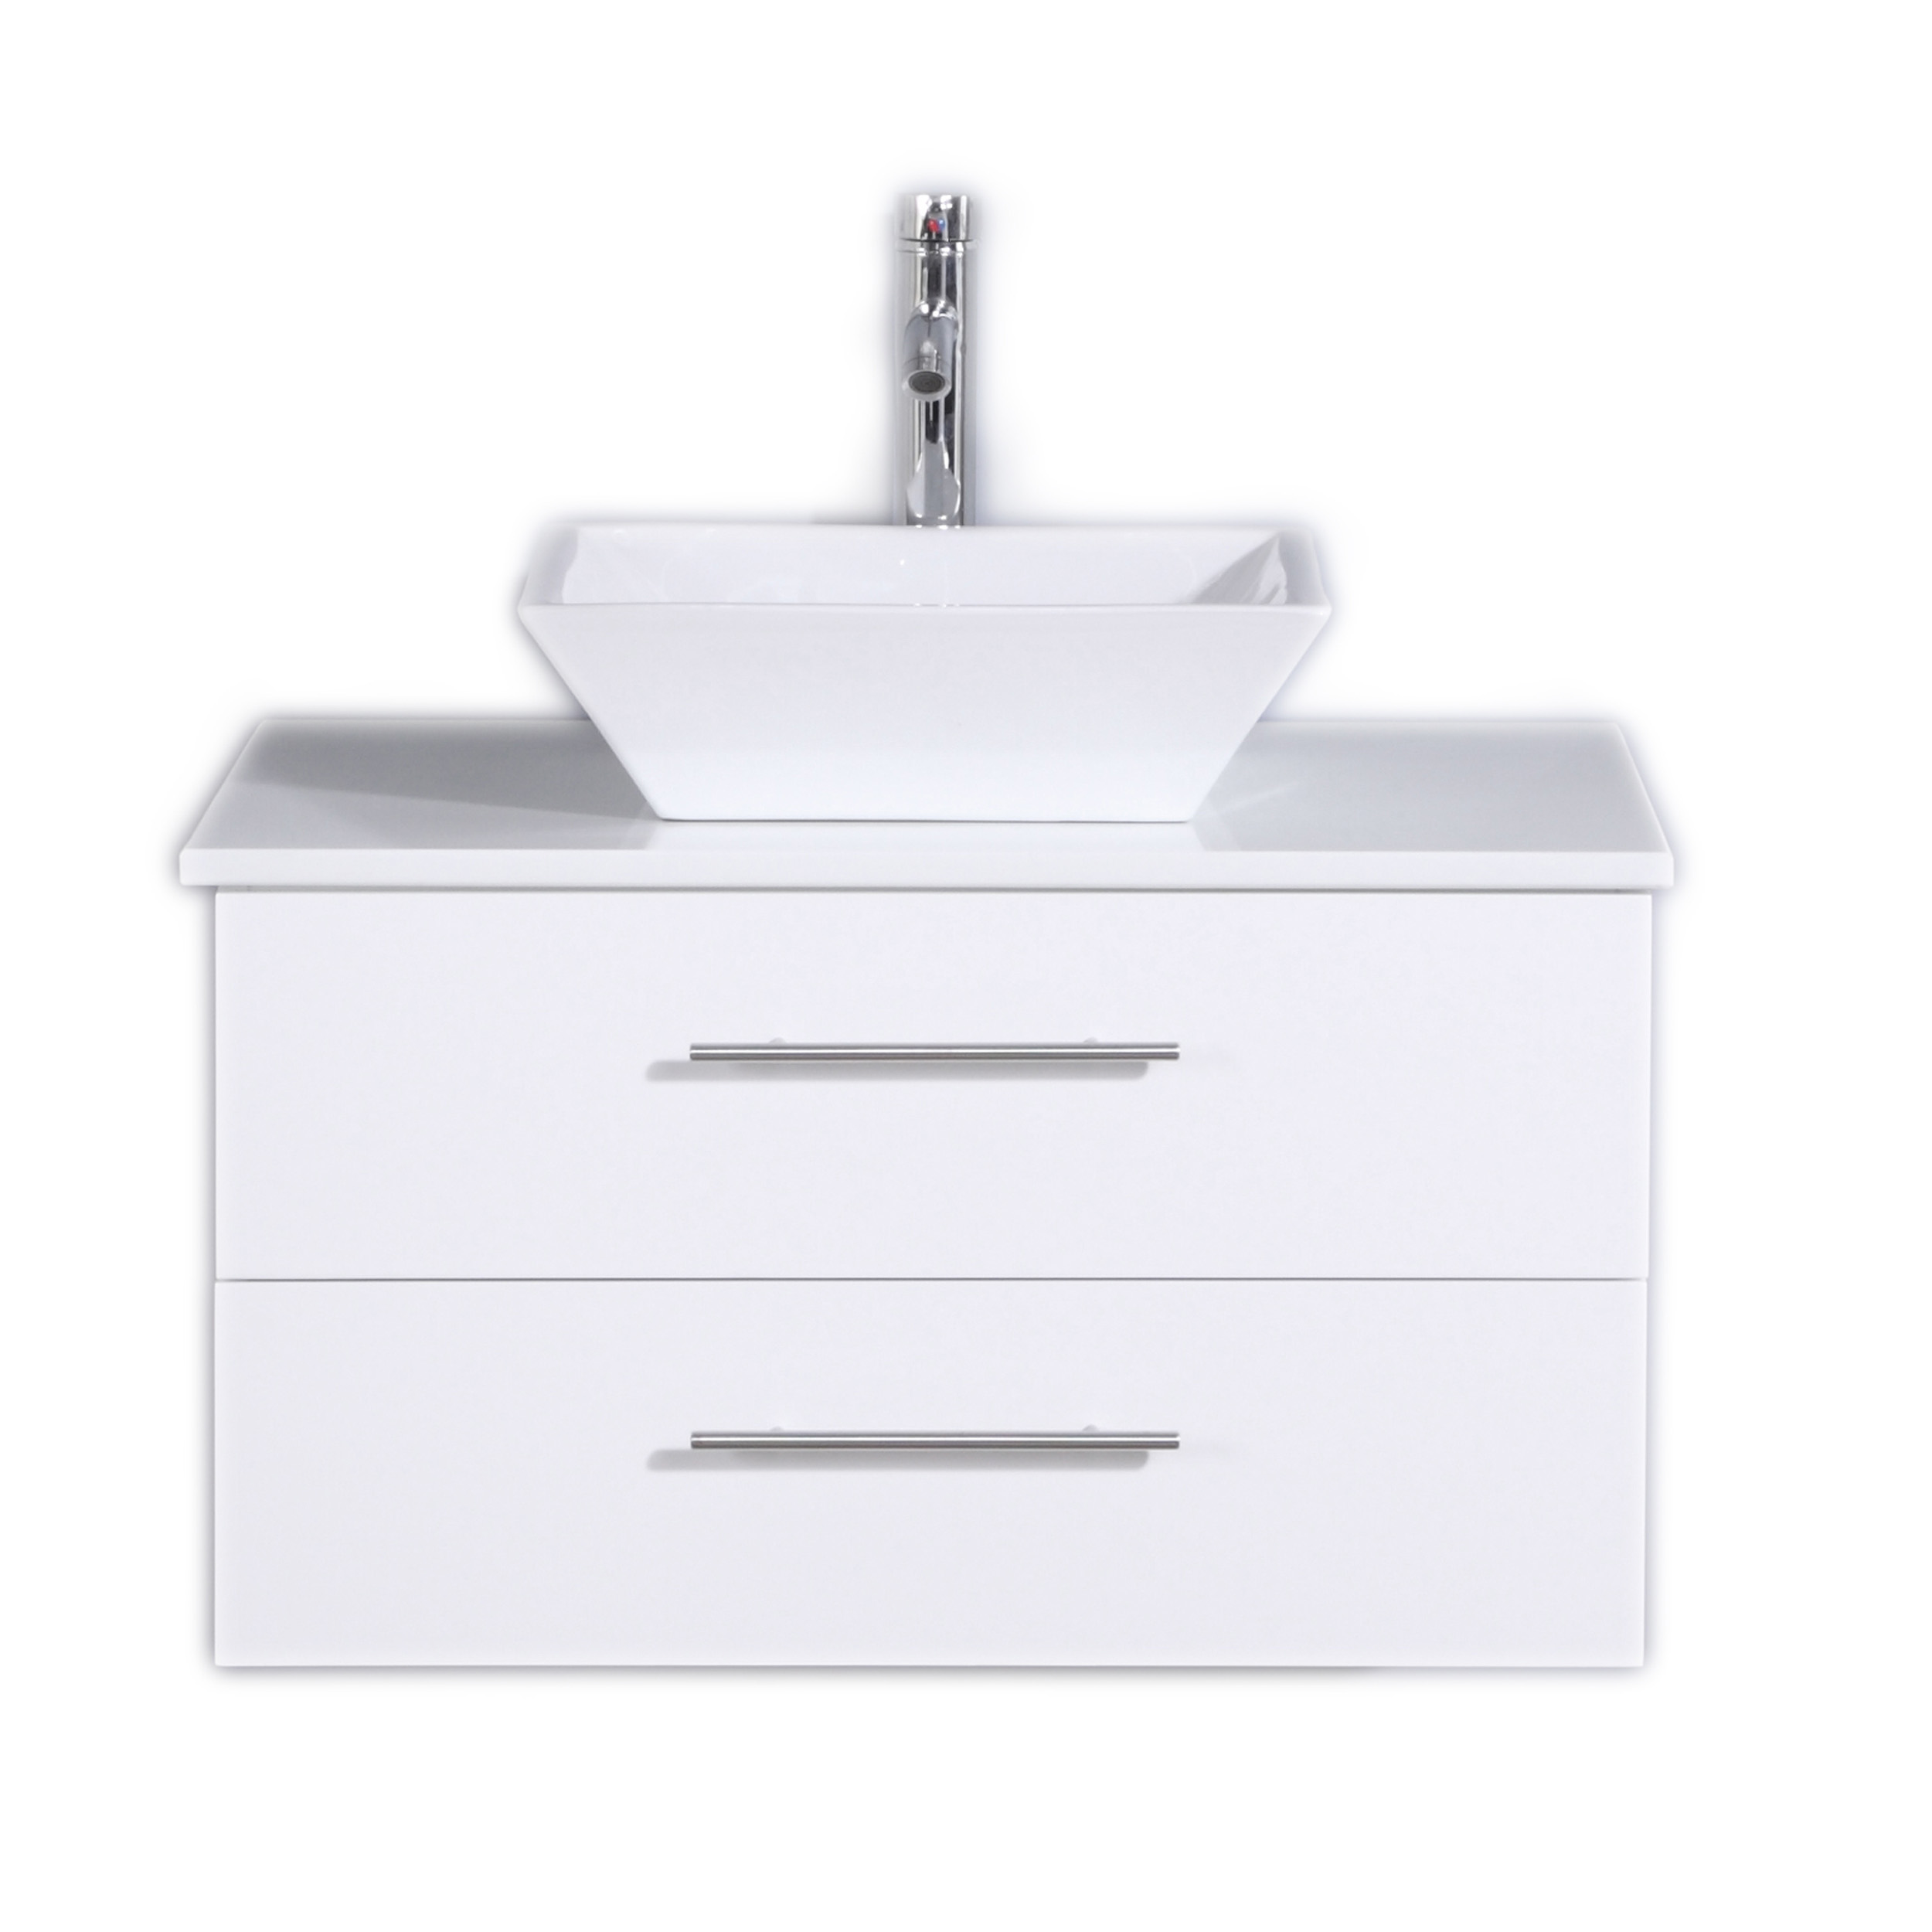 30 Inch White Modern Bathroom Vanity